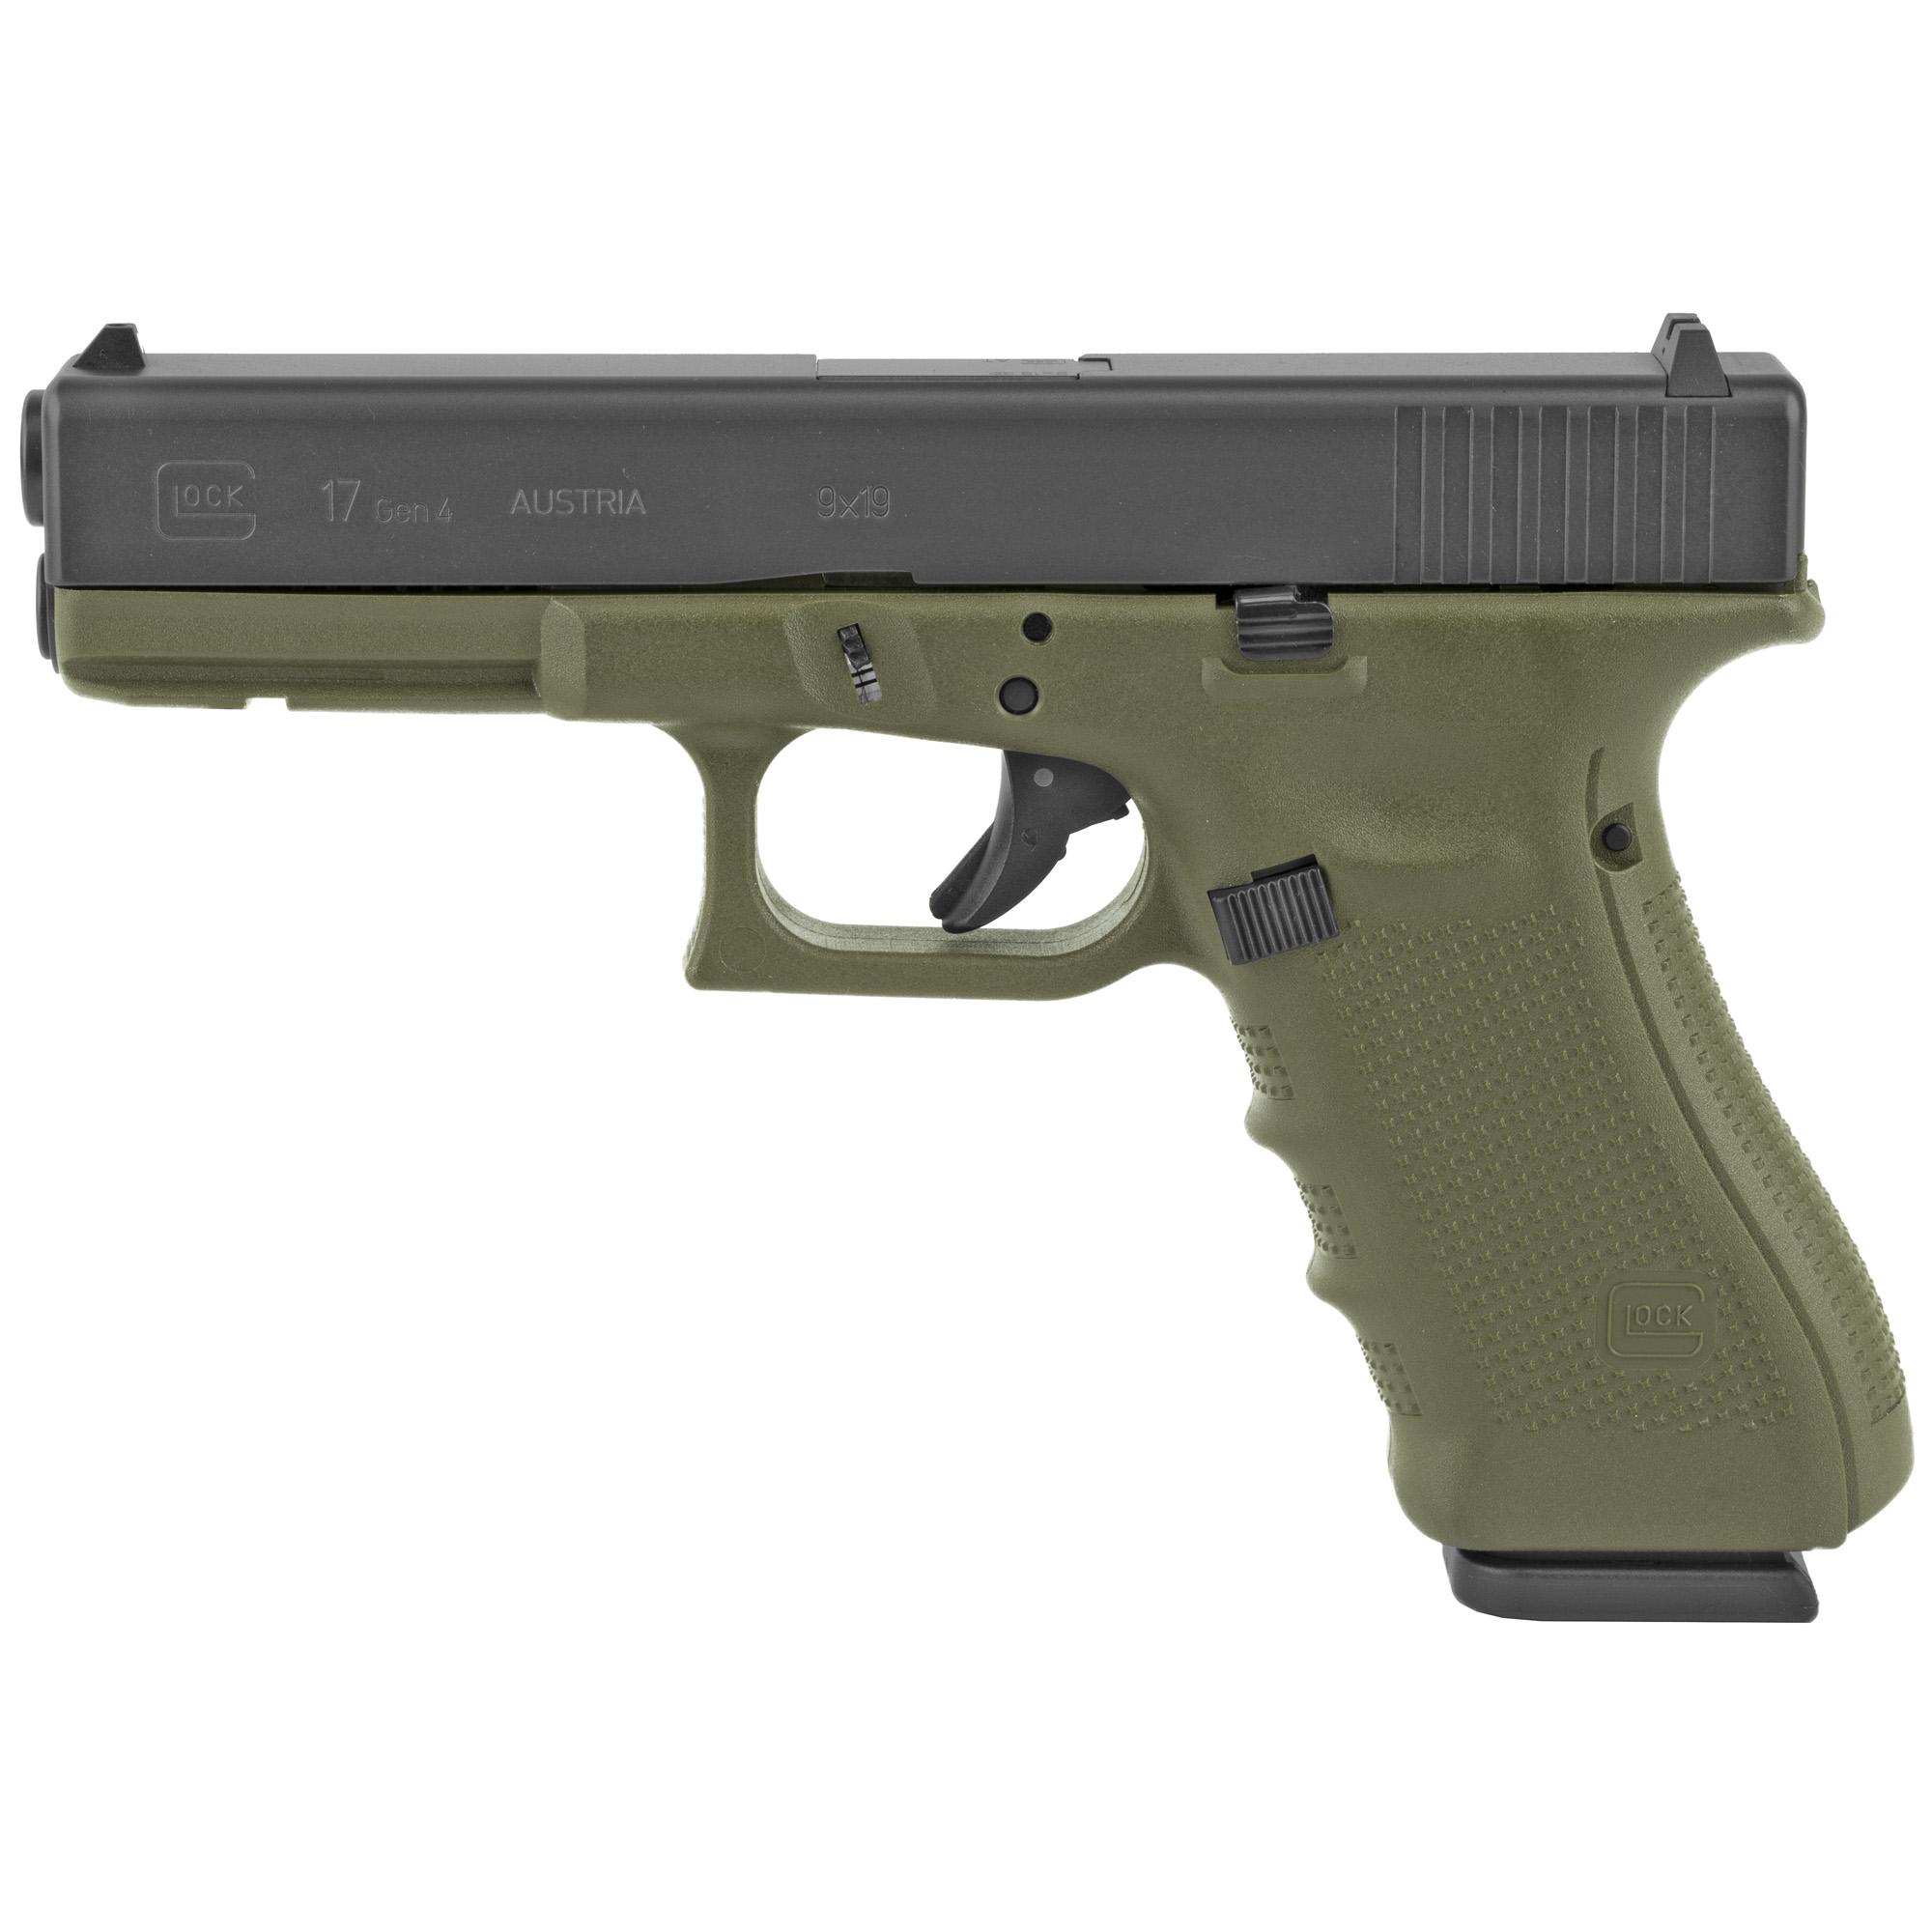 Glock 17 Gen4 9mm 17rd Od Rebuilt